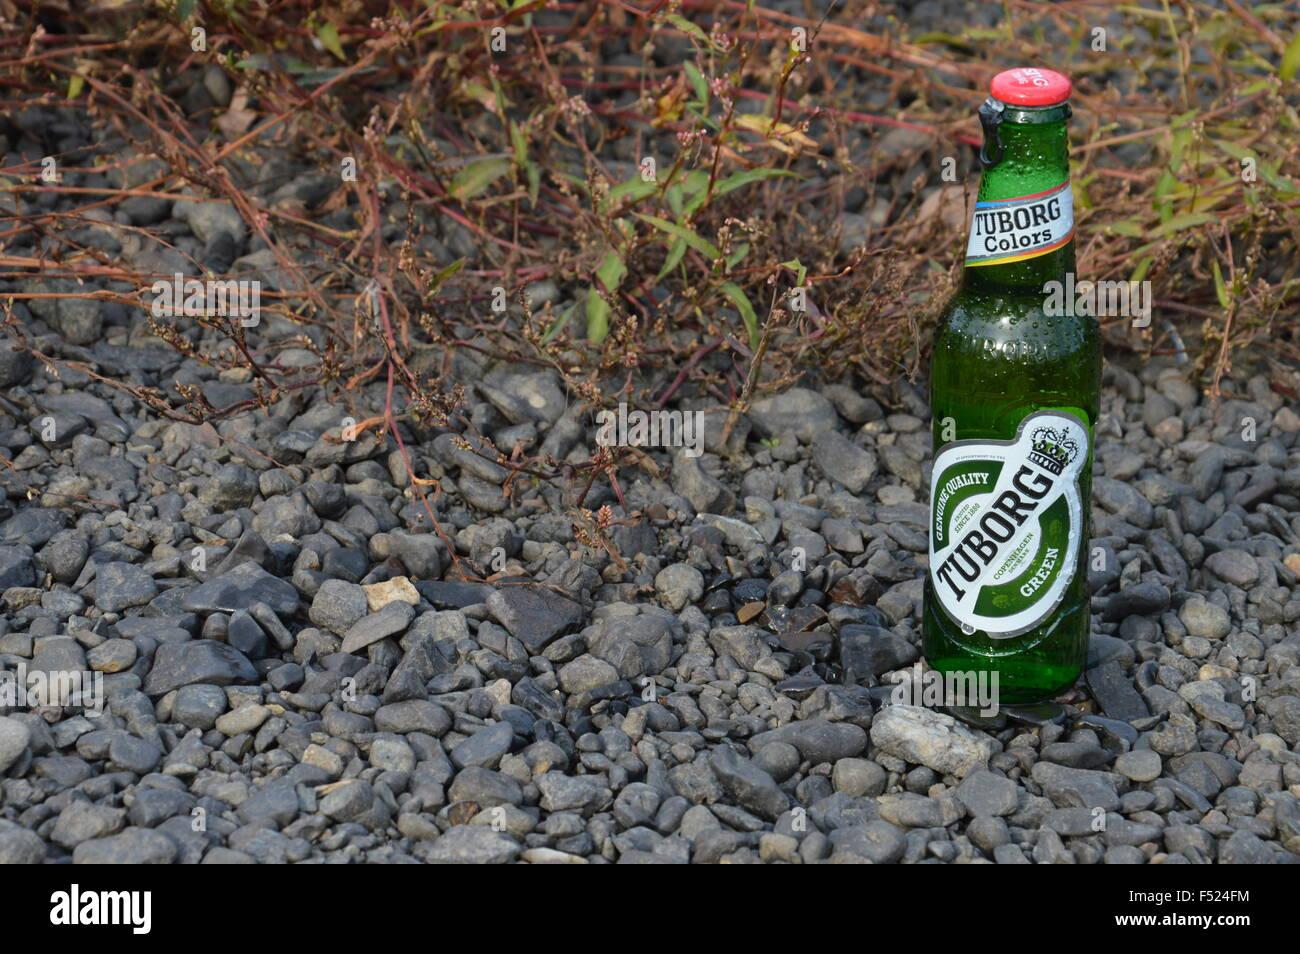 illustrative bottle alcoholic beer Tuborg in nature - Stock Image